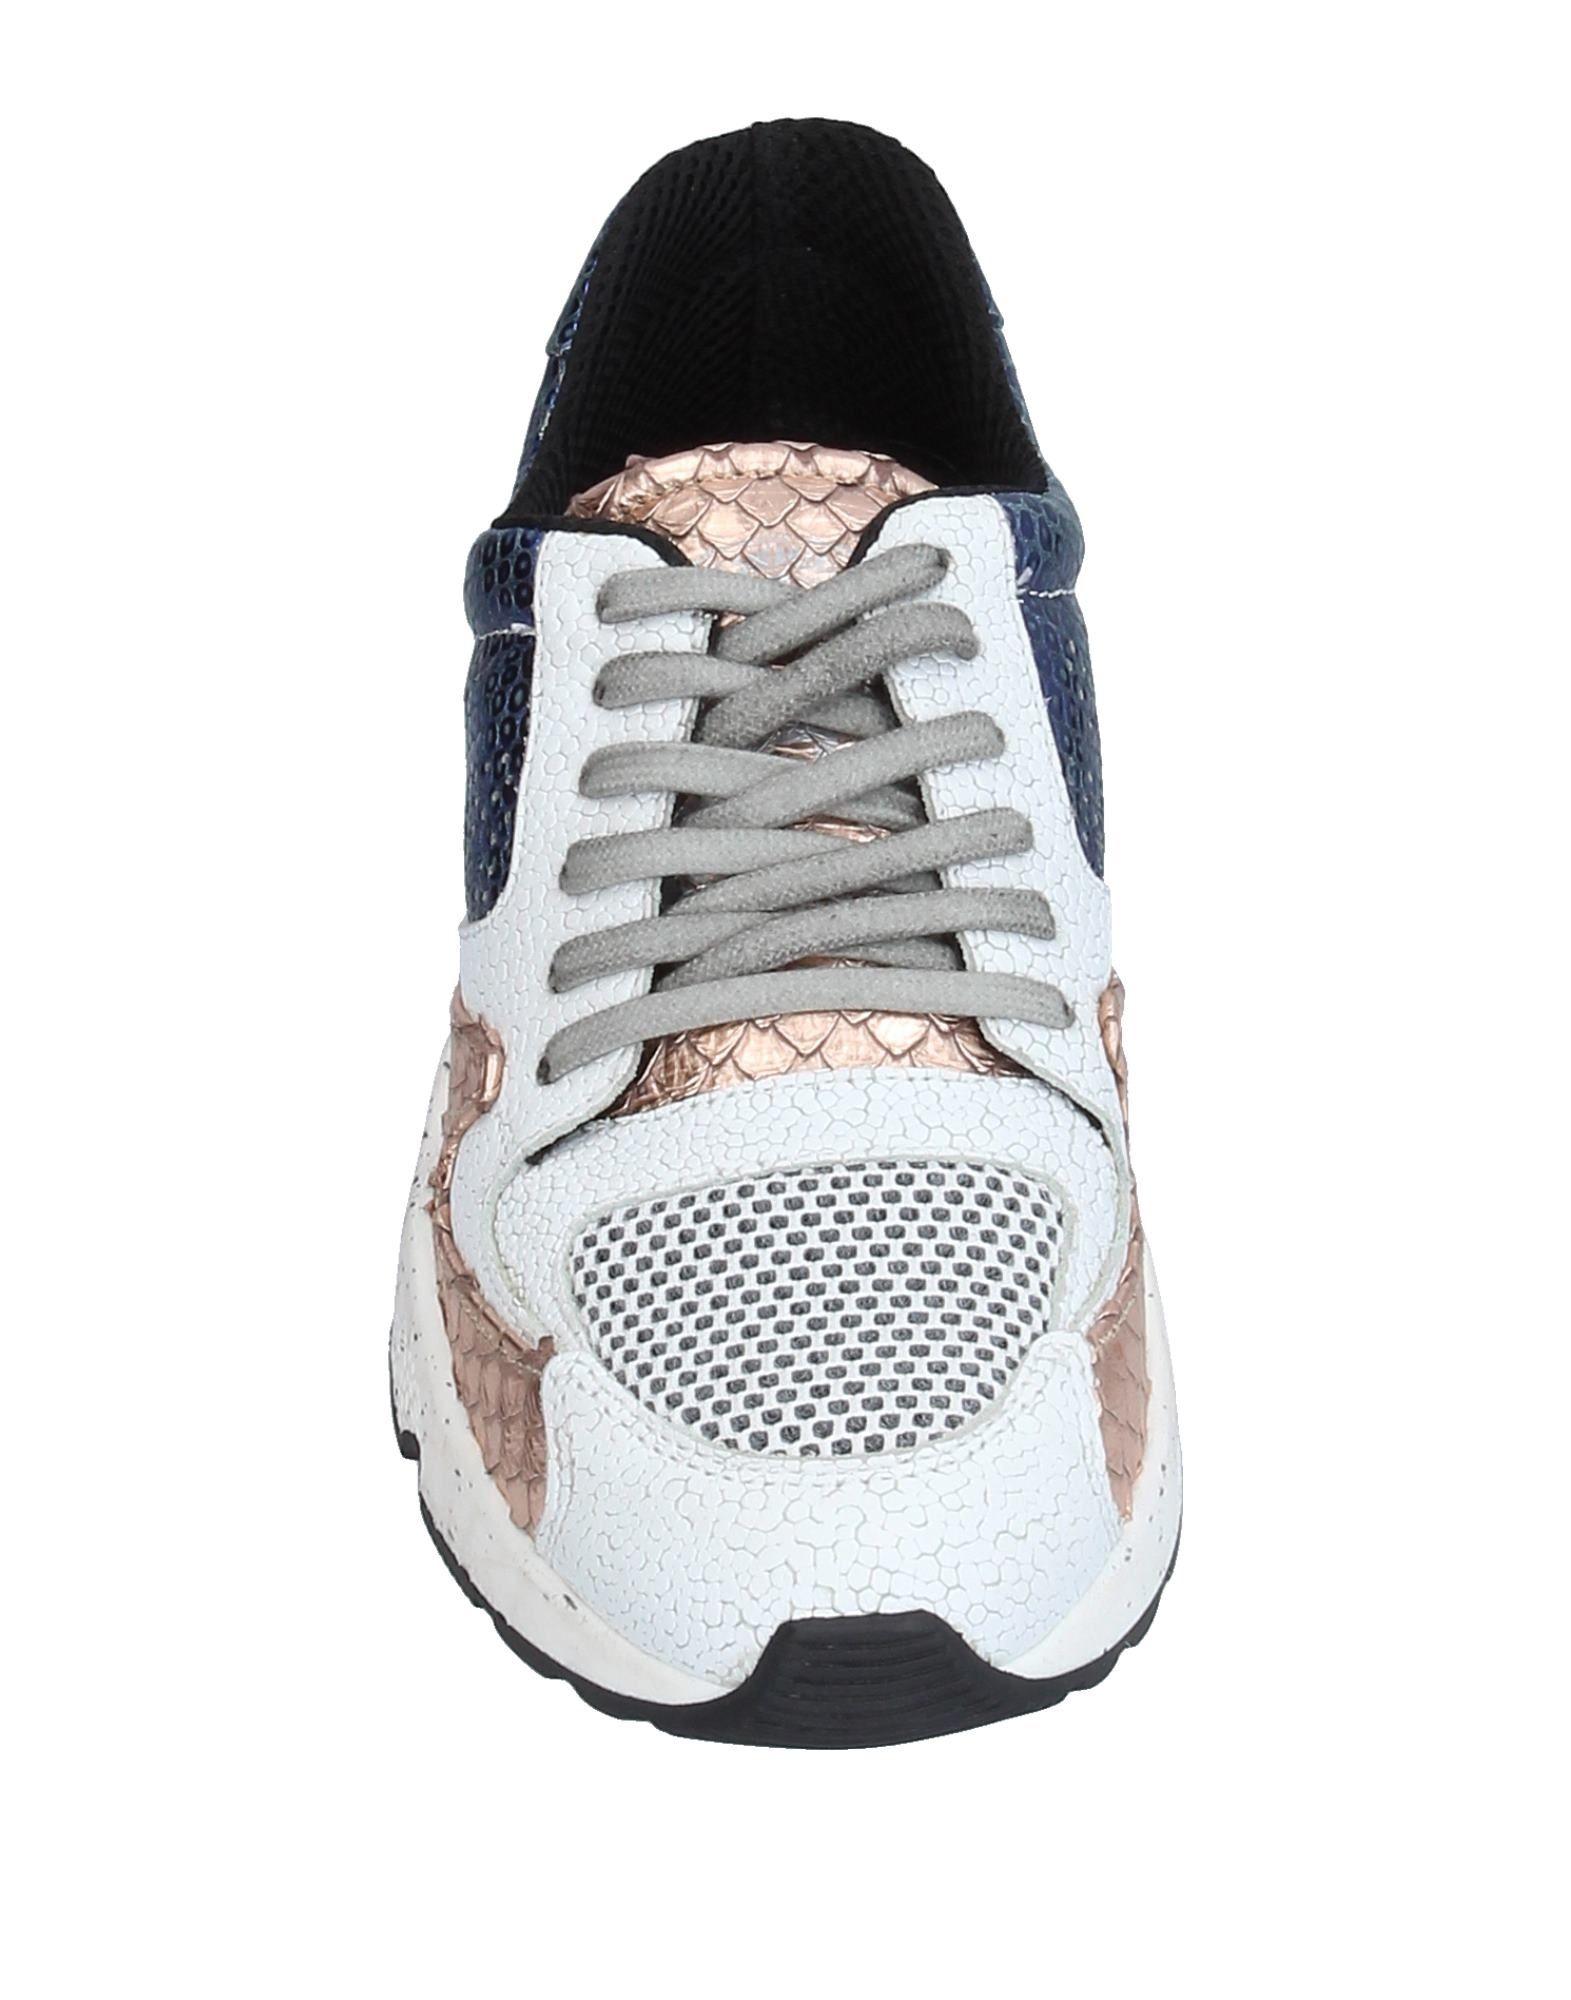 P448 11339363WH Sneakers Damen  11339363WH P448 Gute Qualität beliebte Schuhe 237f9f